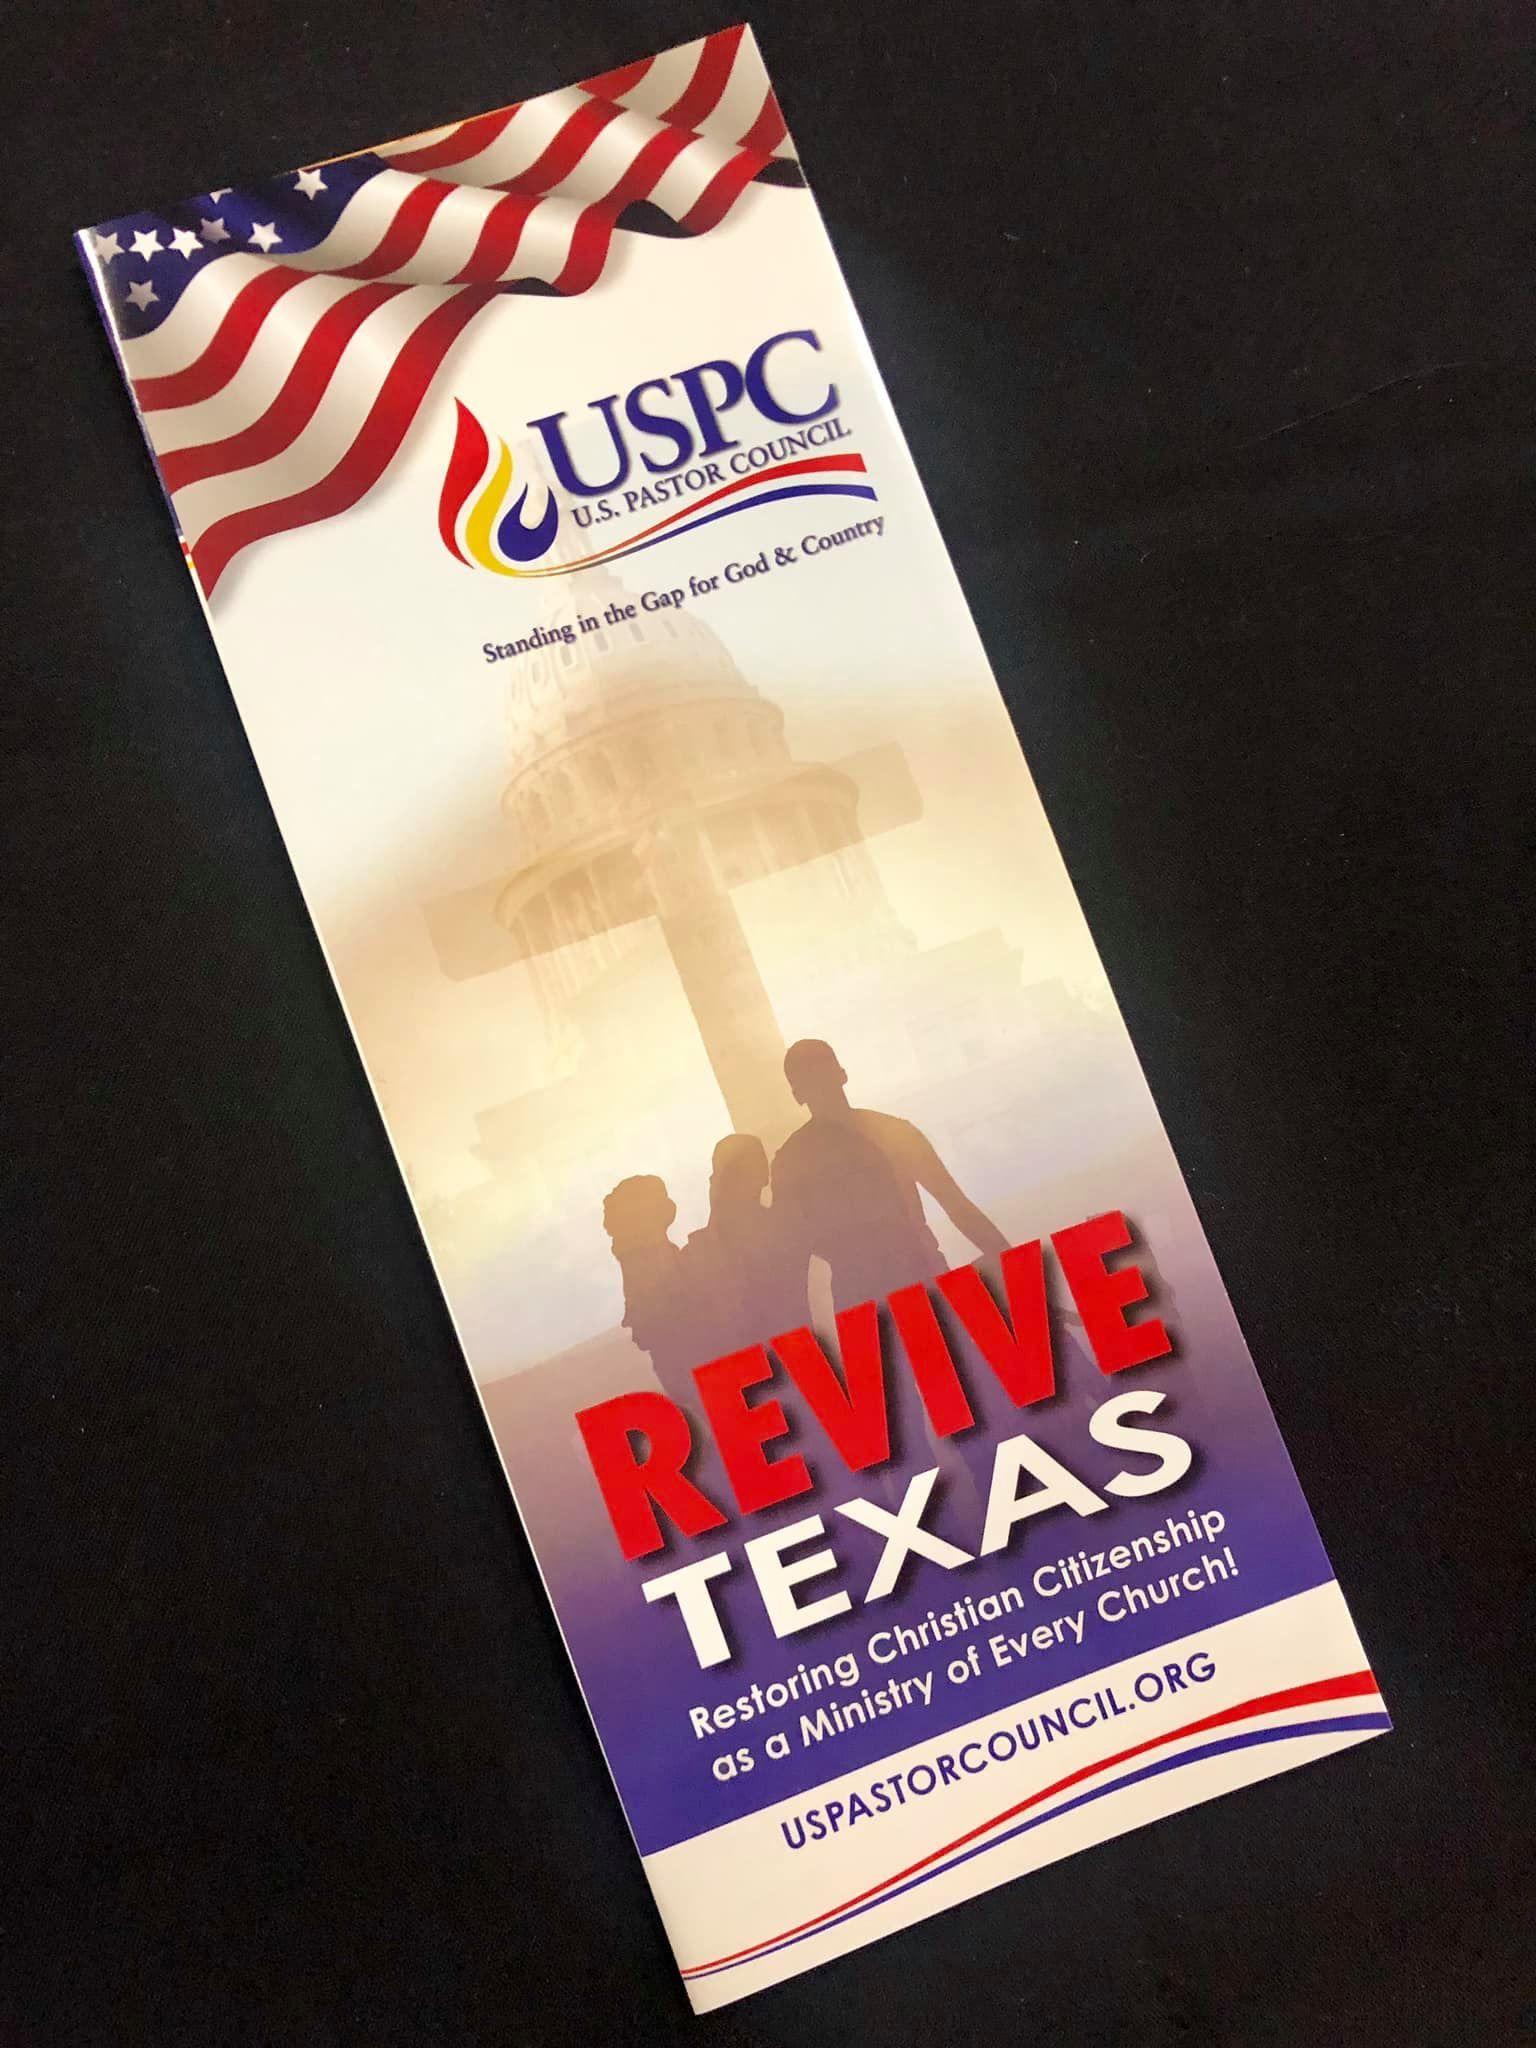 Revive Texas